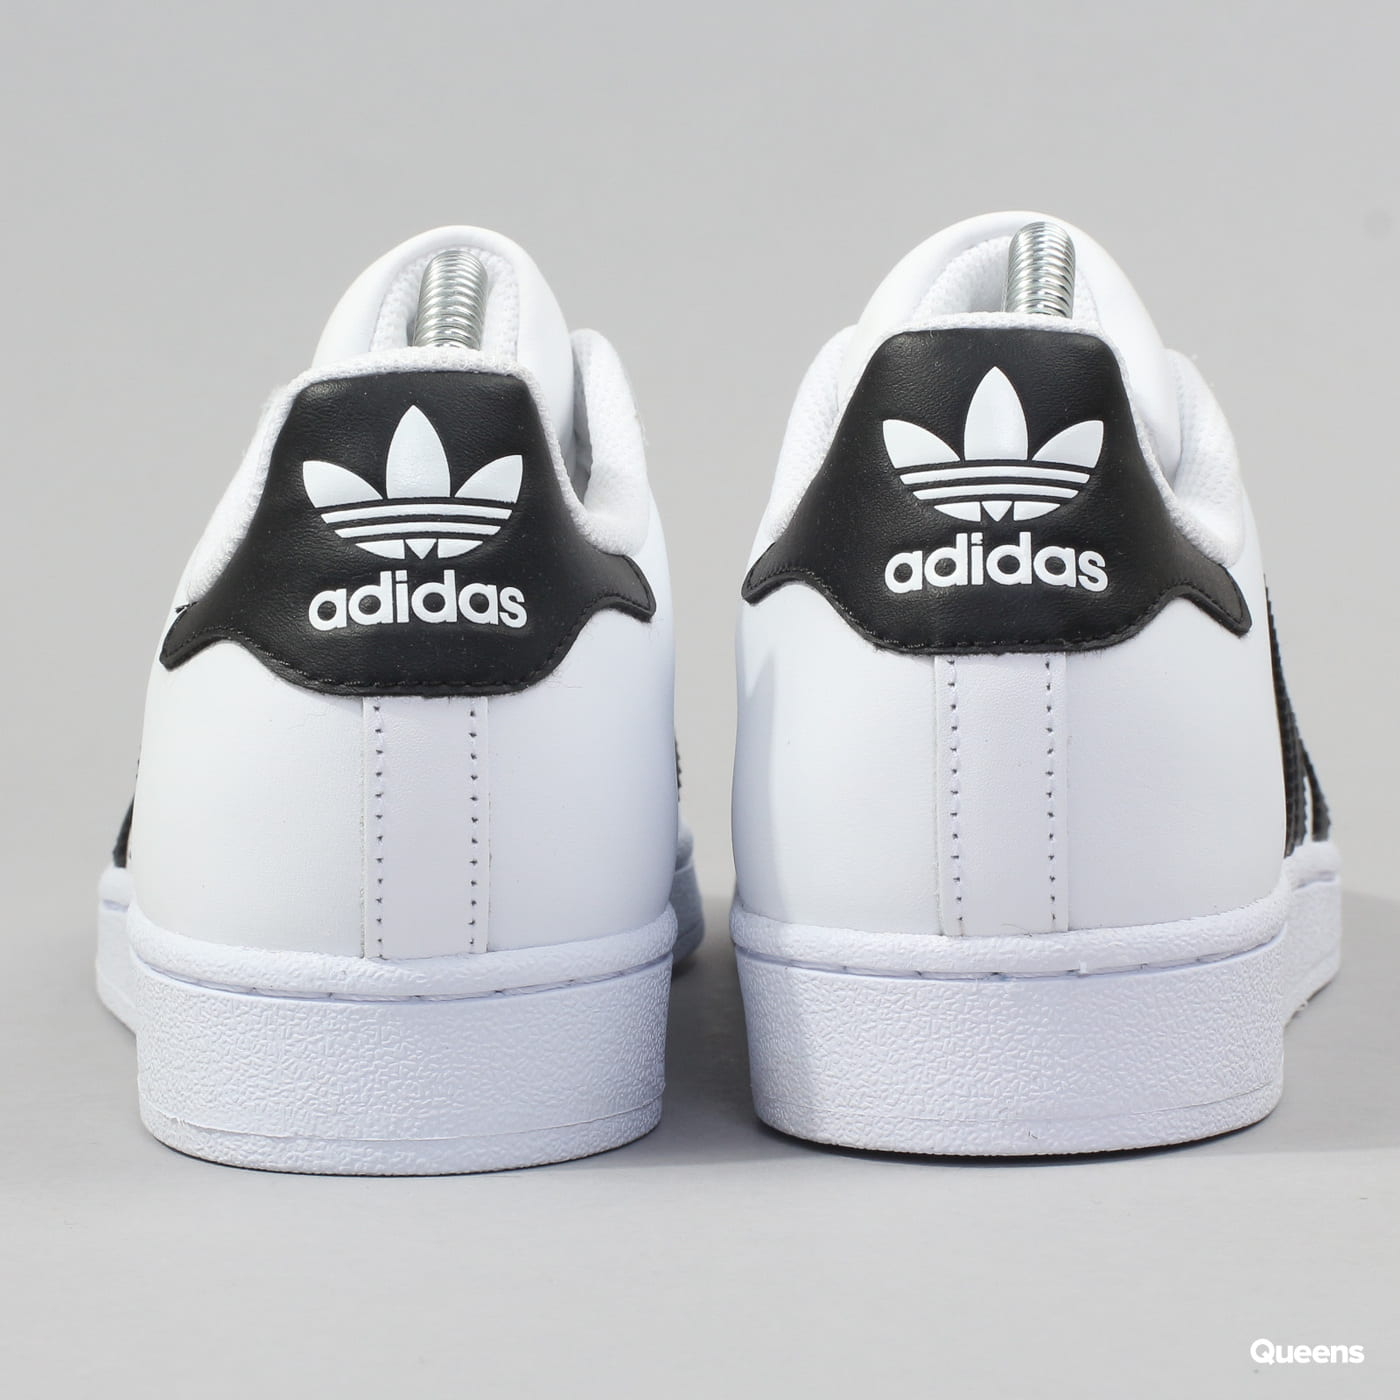 adidas Originals Superstar ftwwht / cblack / ftwwht